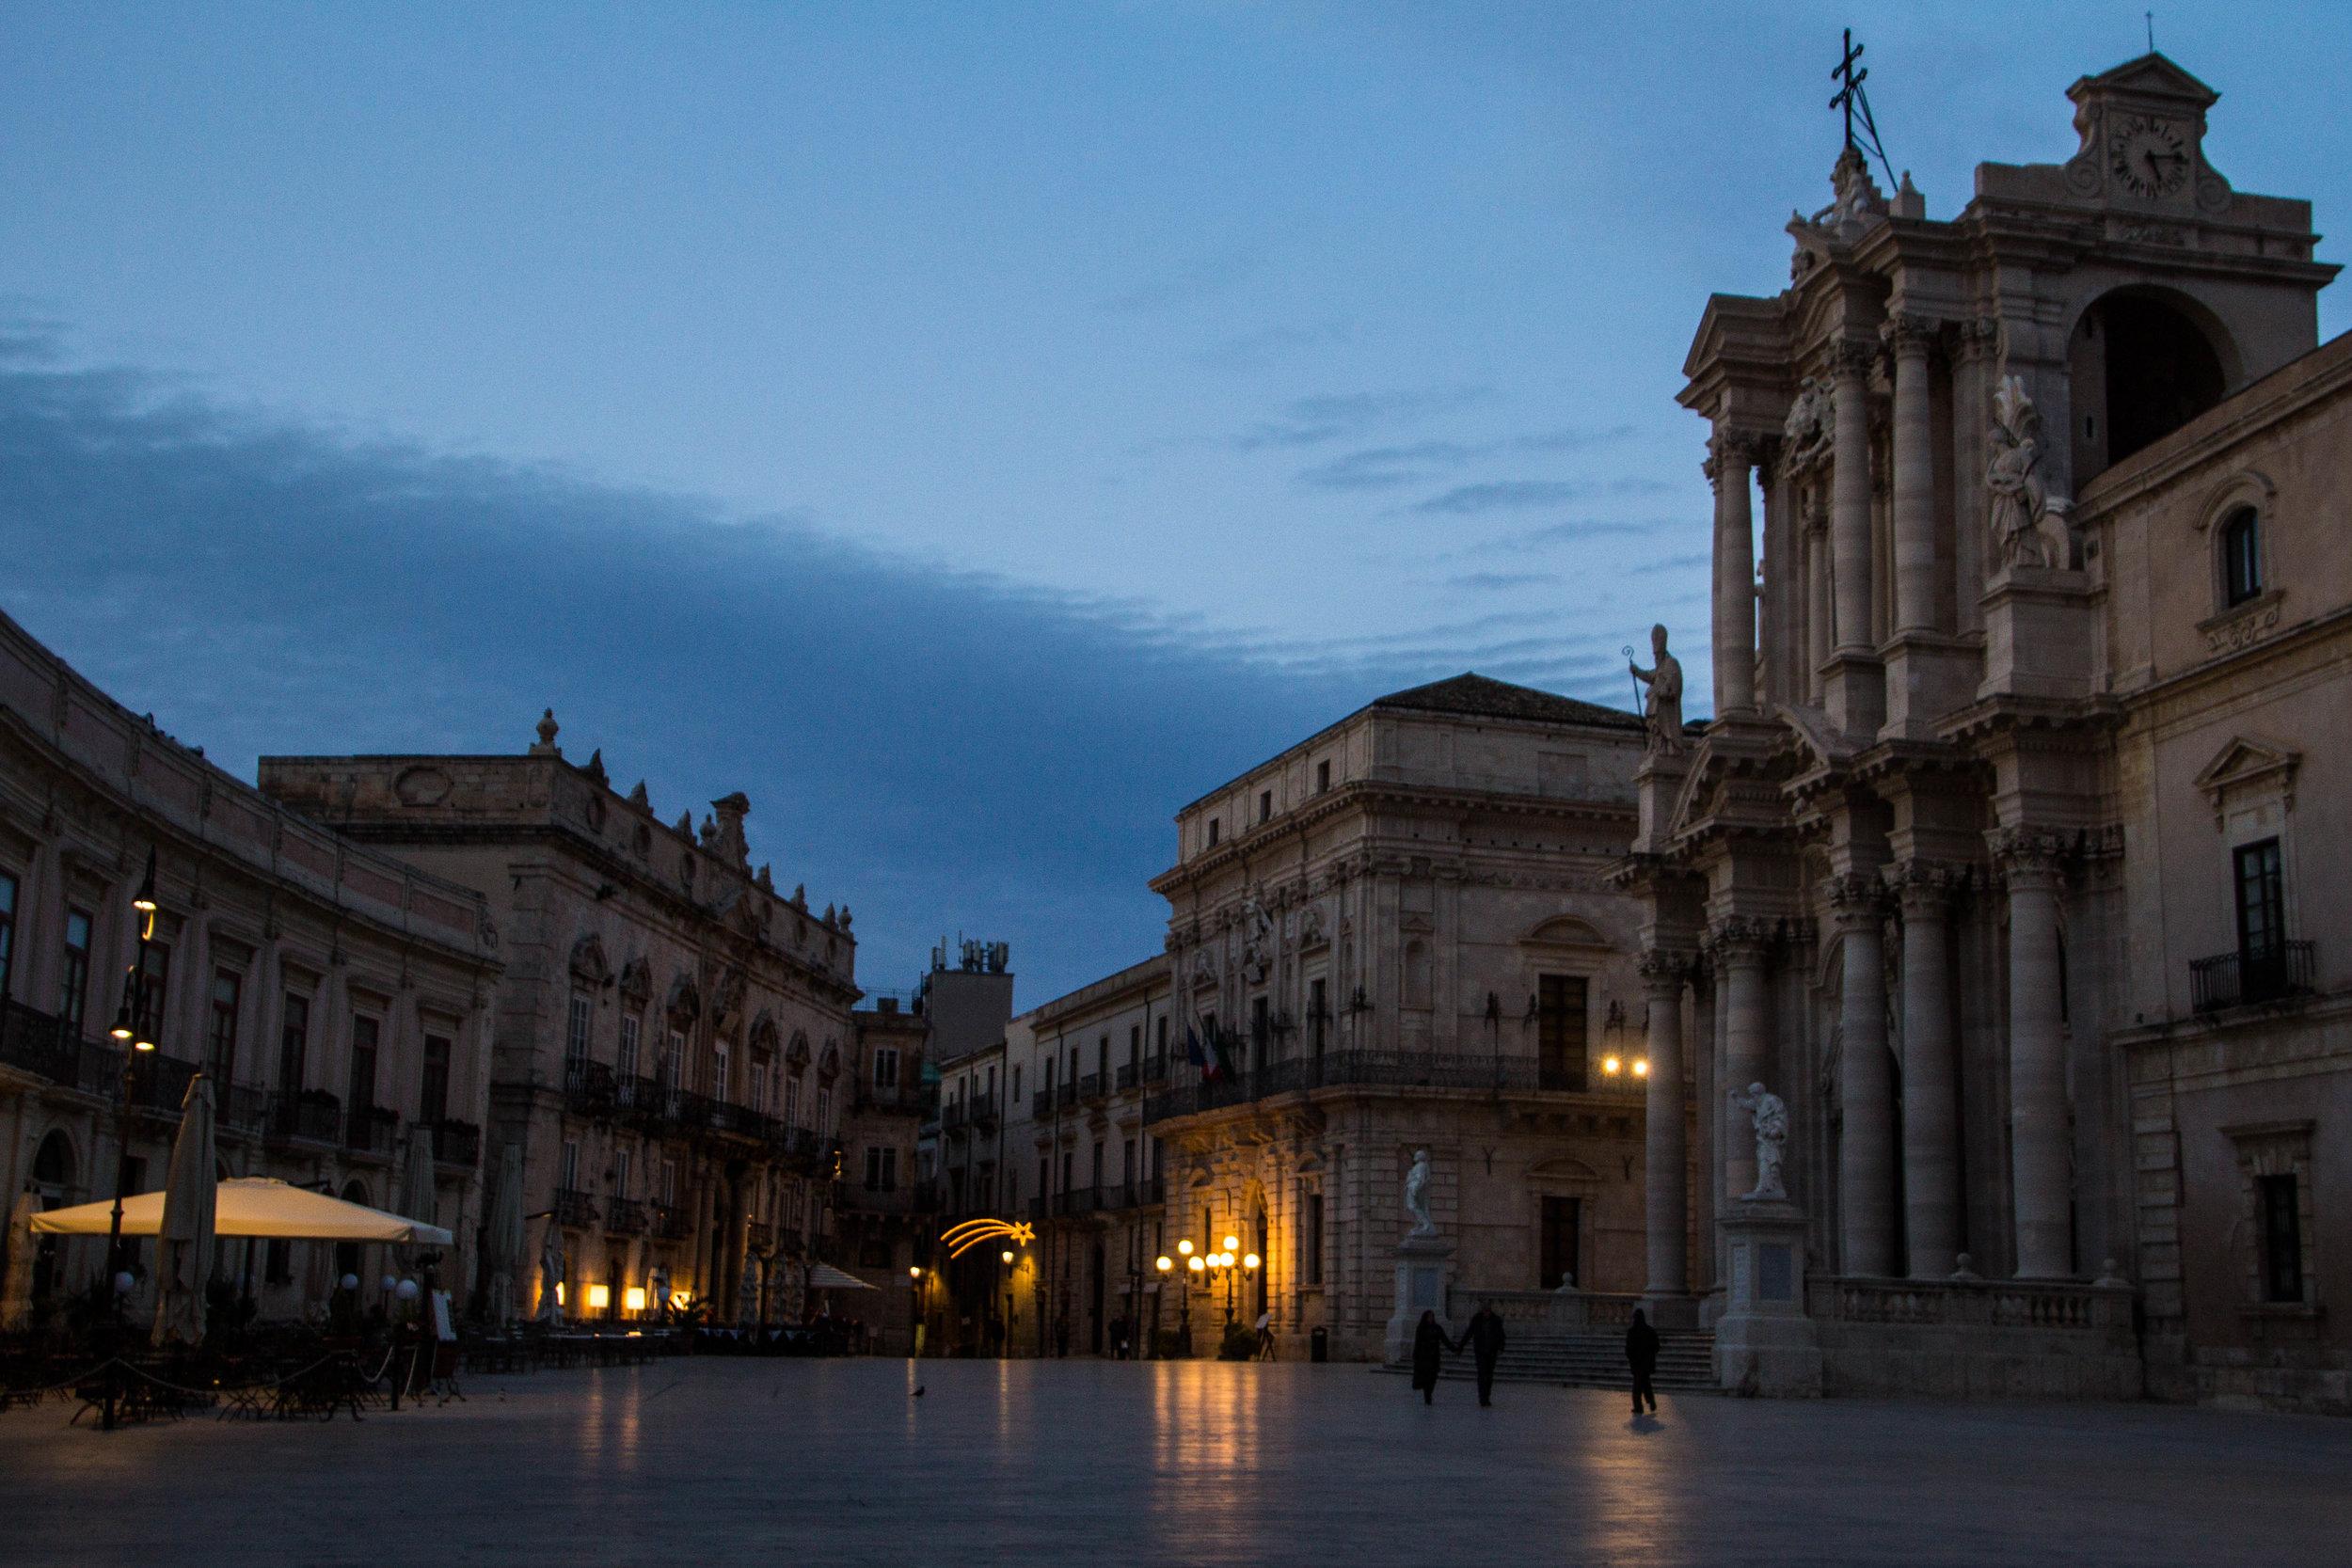 piazza-duomo-sunset-ortygia-syracuse-sicily-22.jpg